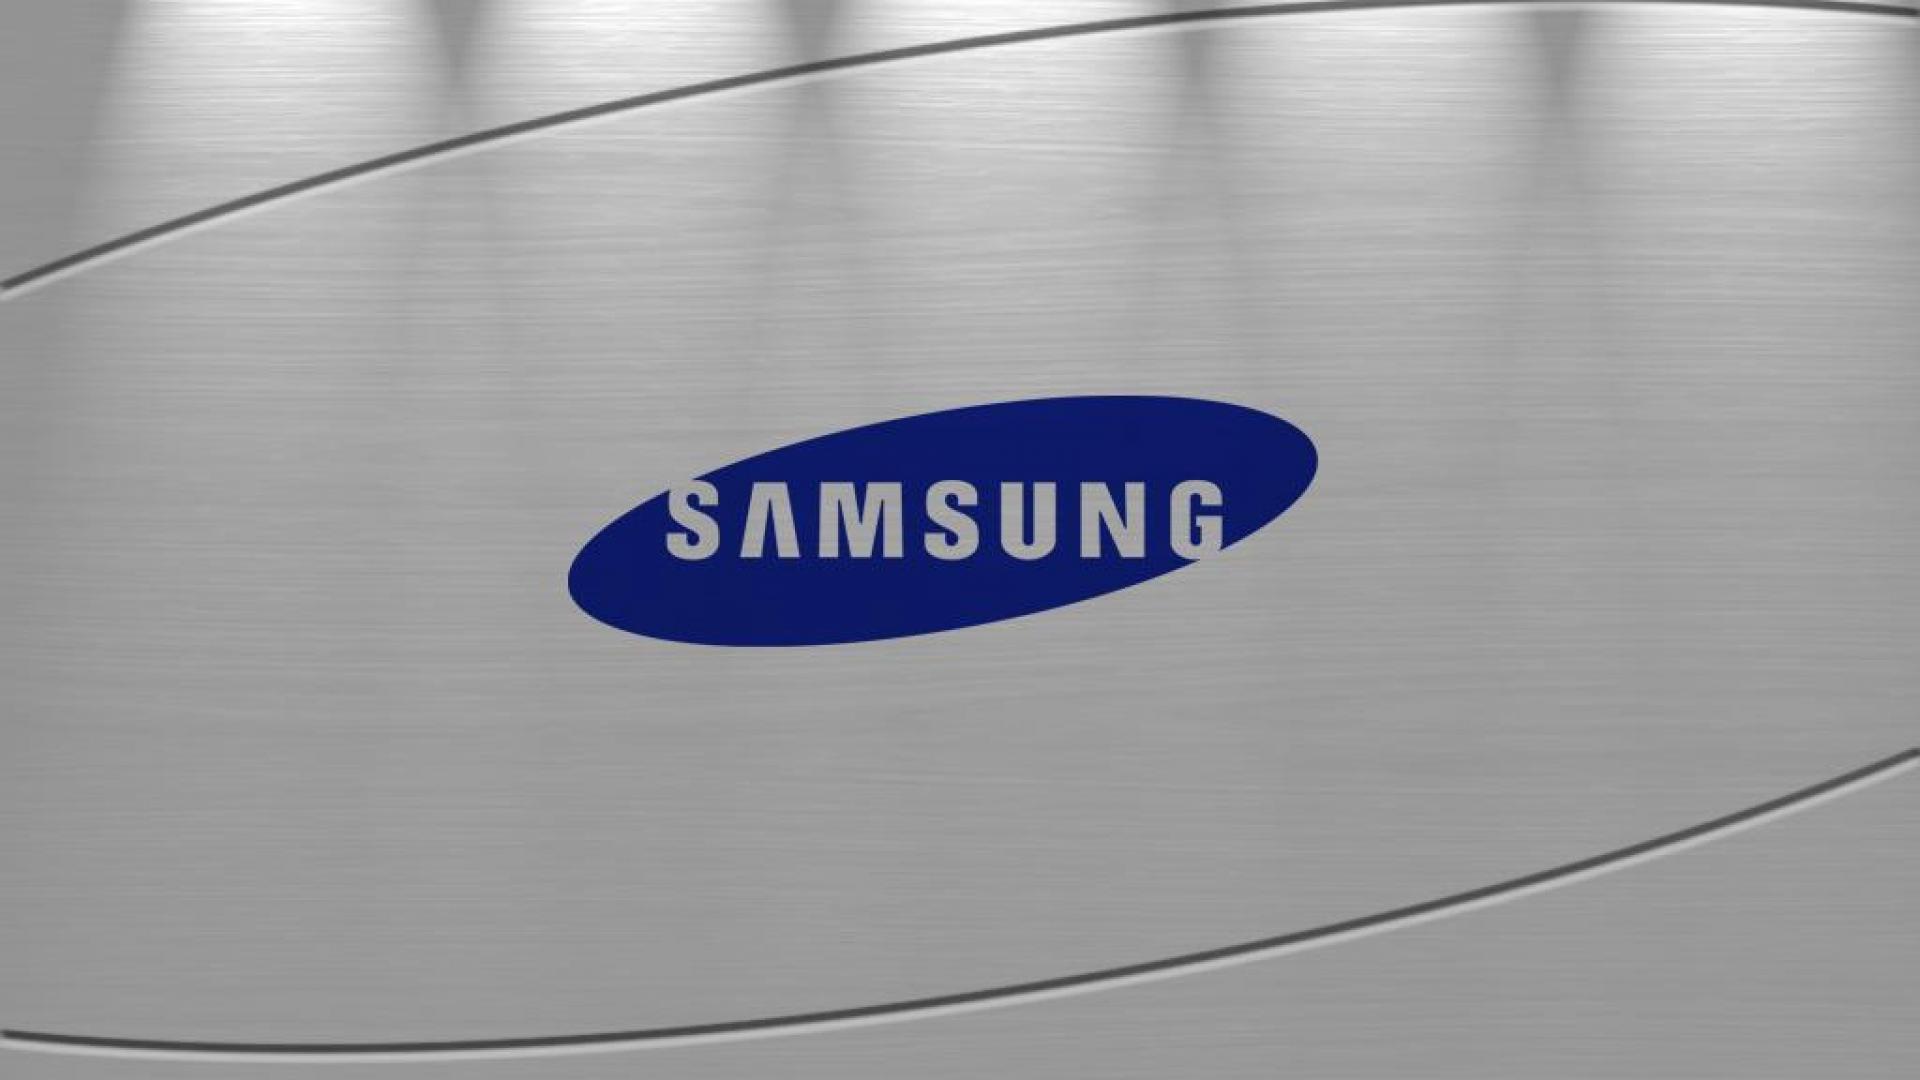 Wallpaper 4k Samsung Galaxy S8 Girls Samsung Wallpaper 1920x1080 1336